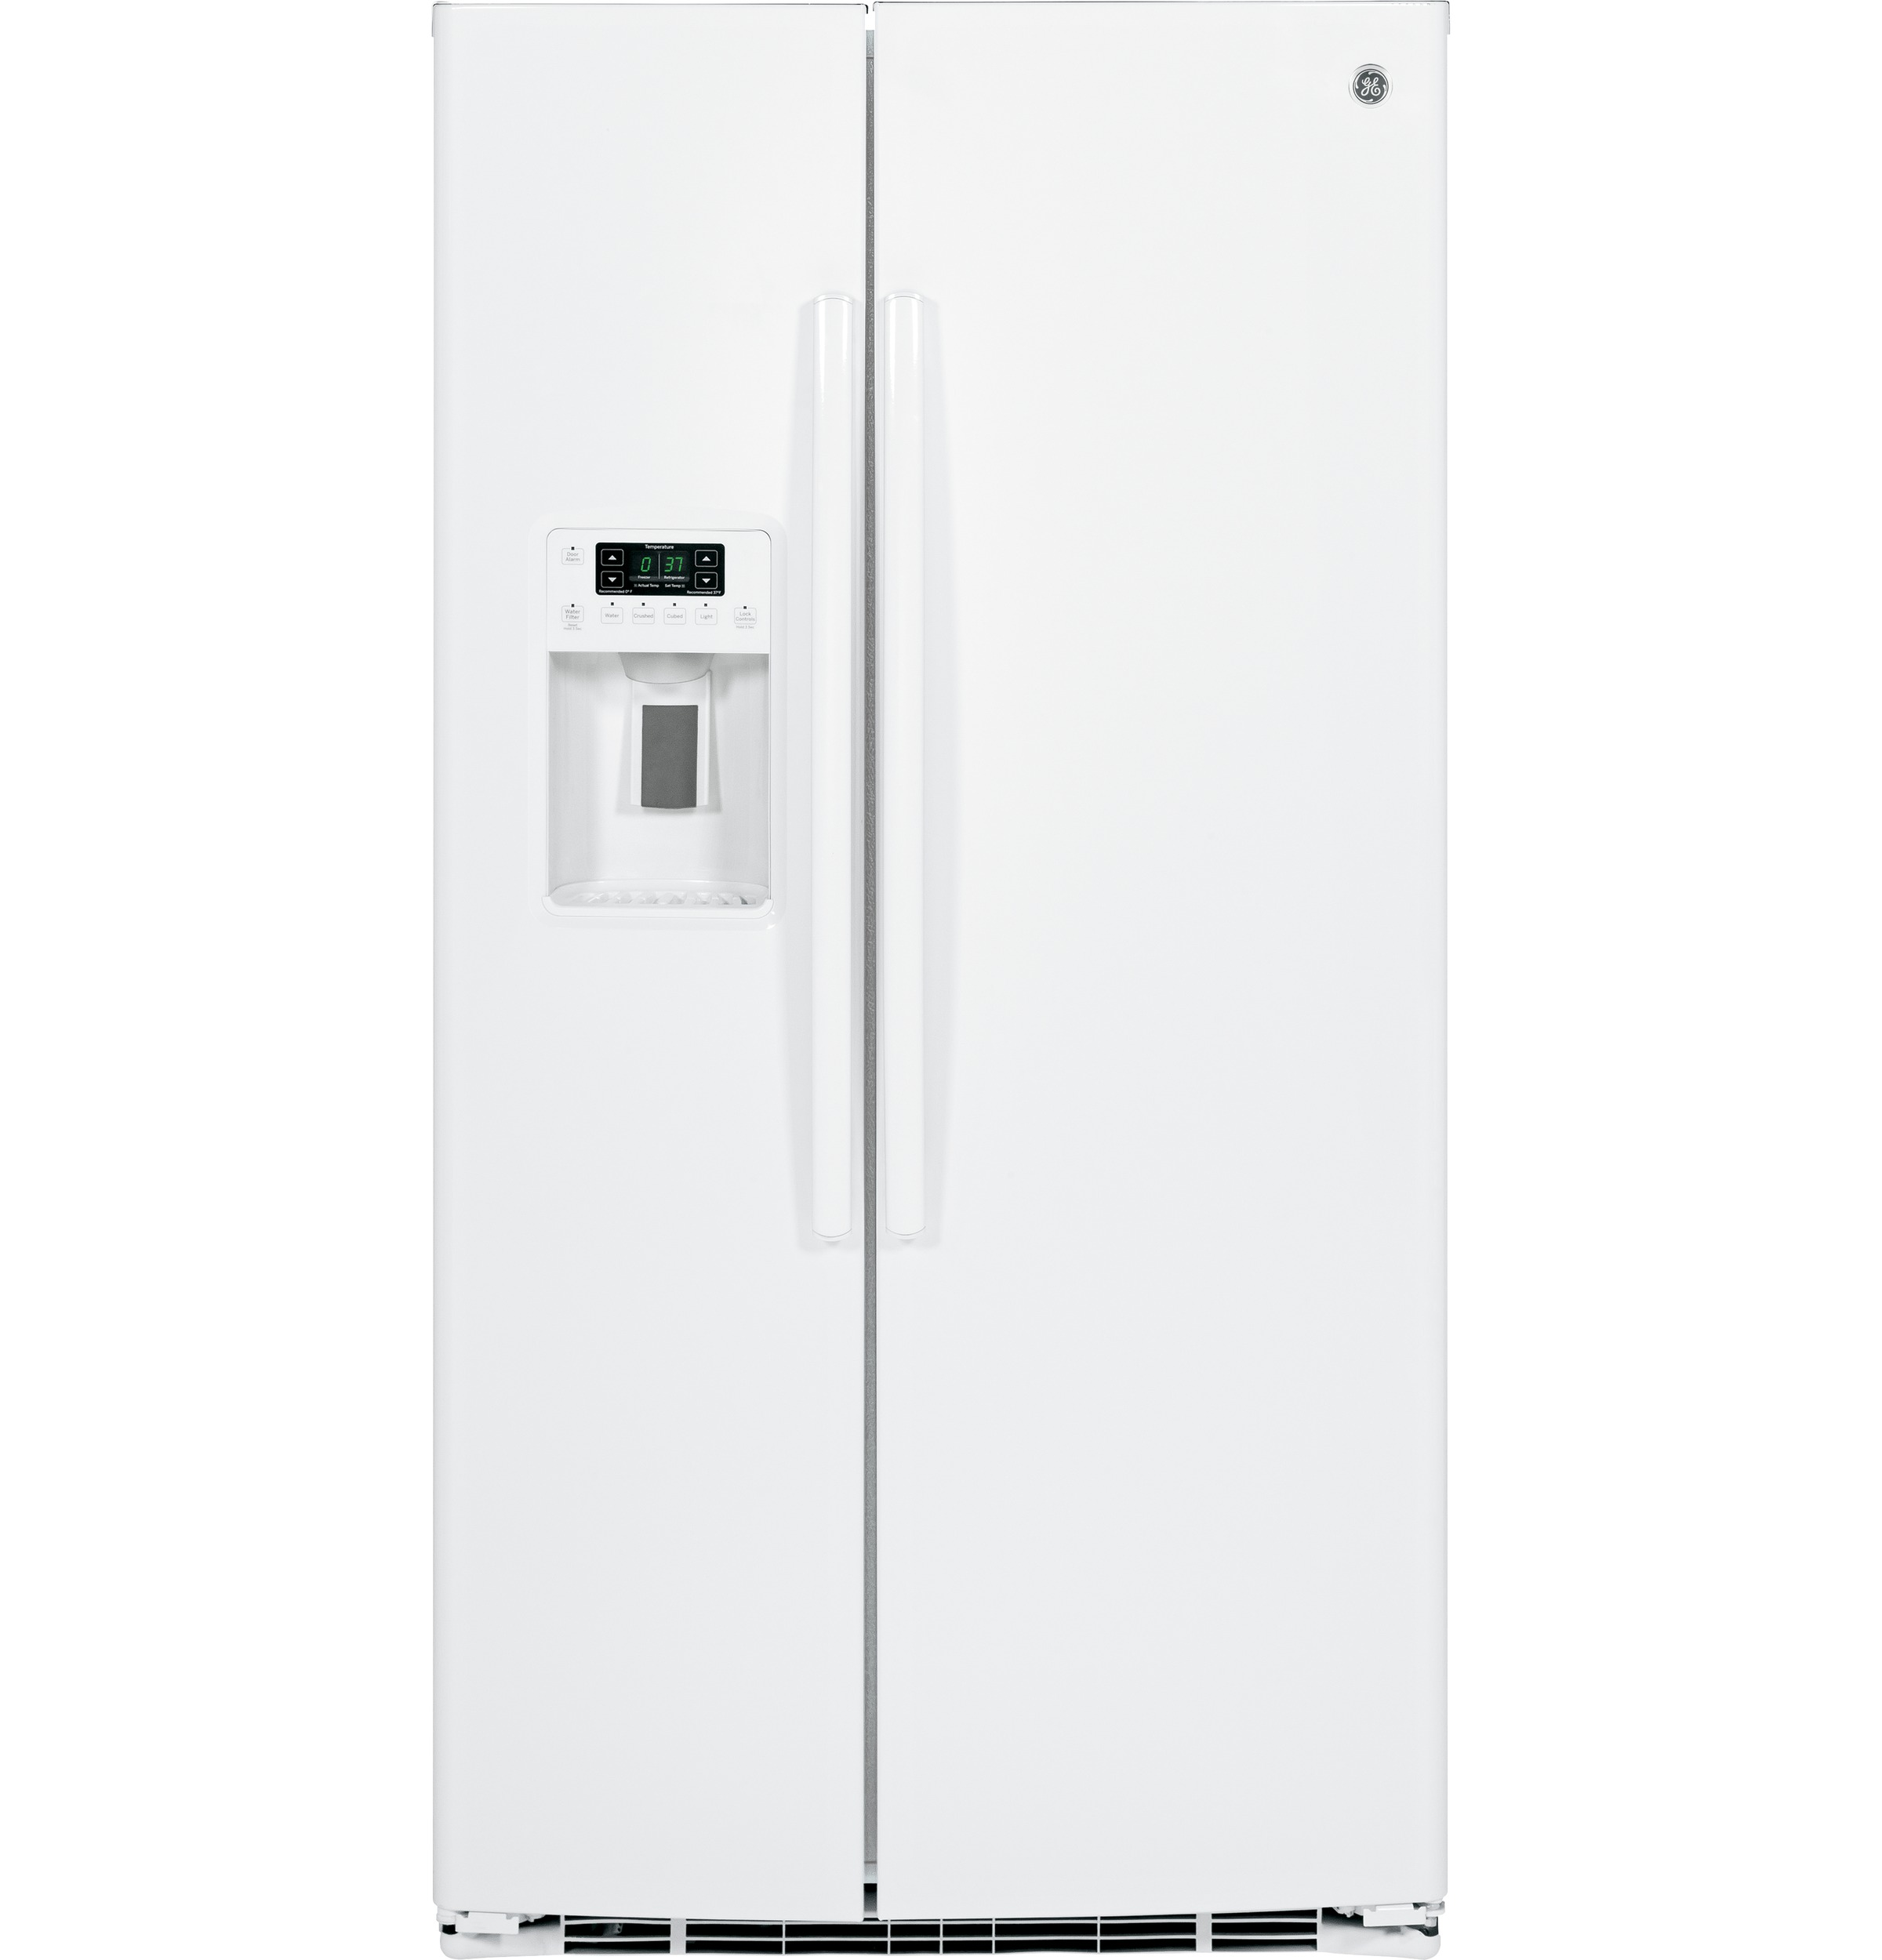 GE 奇異 720L 獨立式對開製冰冰箱 GSE25HGHWW